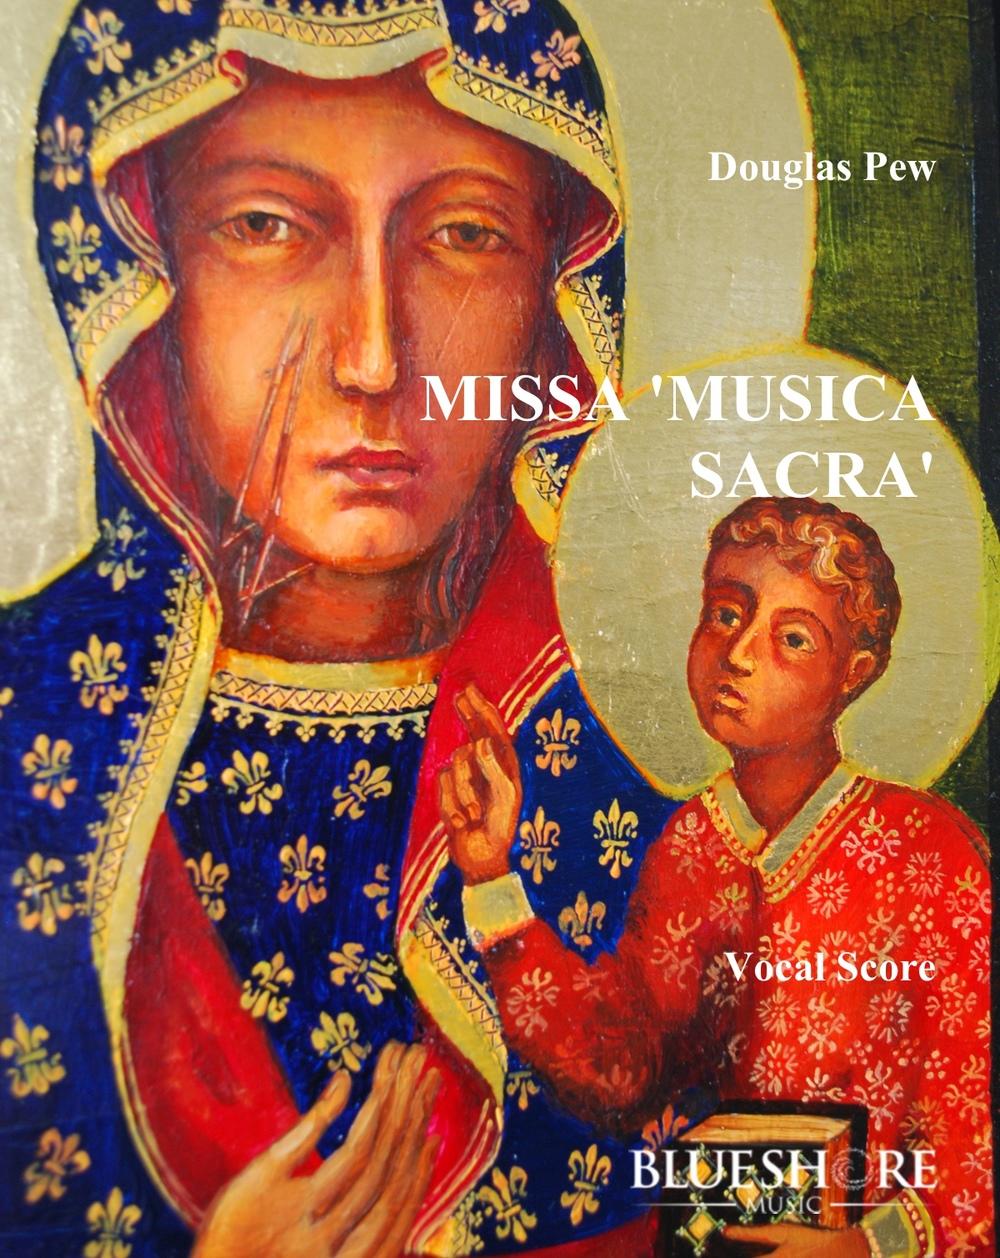 Missa 'Musica Sacra', for SATB and Organ, or Double Chorus a cappella